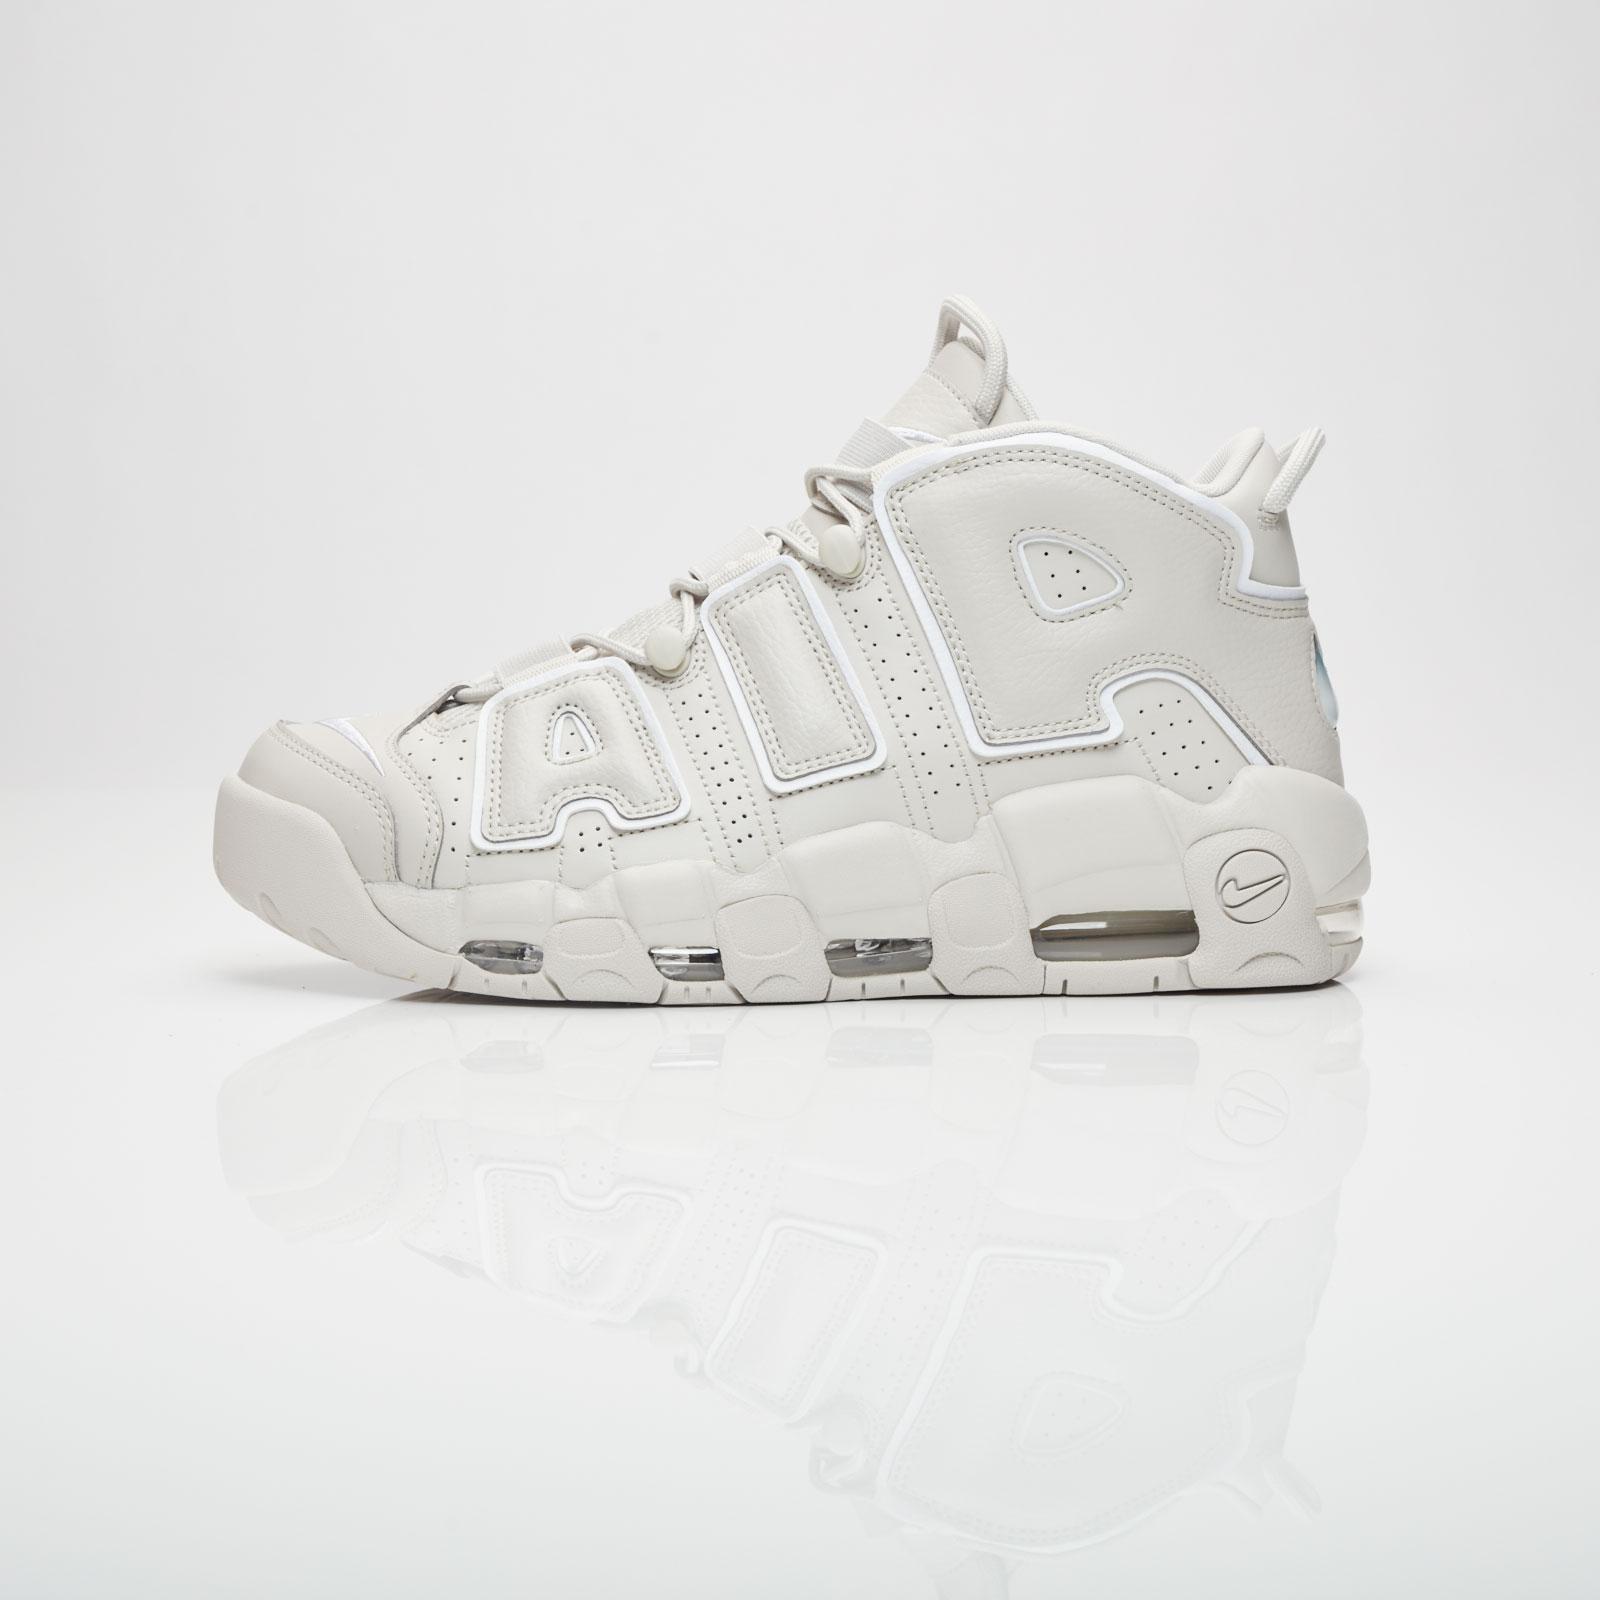 bde3c63d40 Nike Air More Uptempo 96 - 921948-001 - Sneakersnstuff | sneakers &  streetwear online since 1999